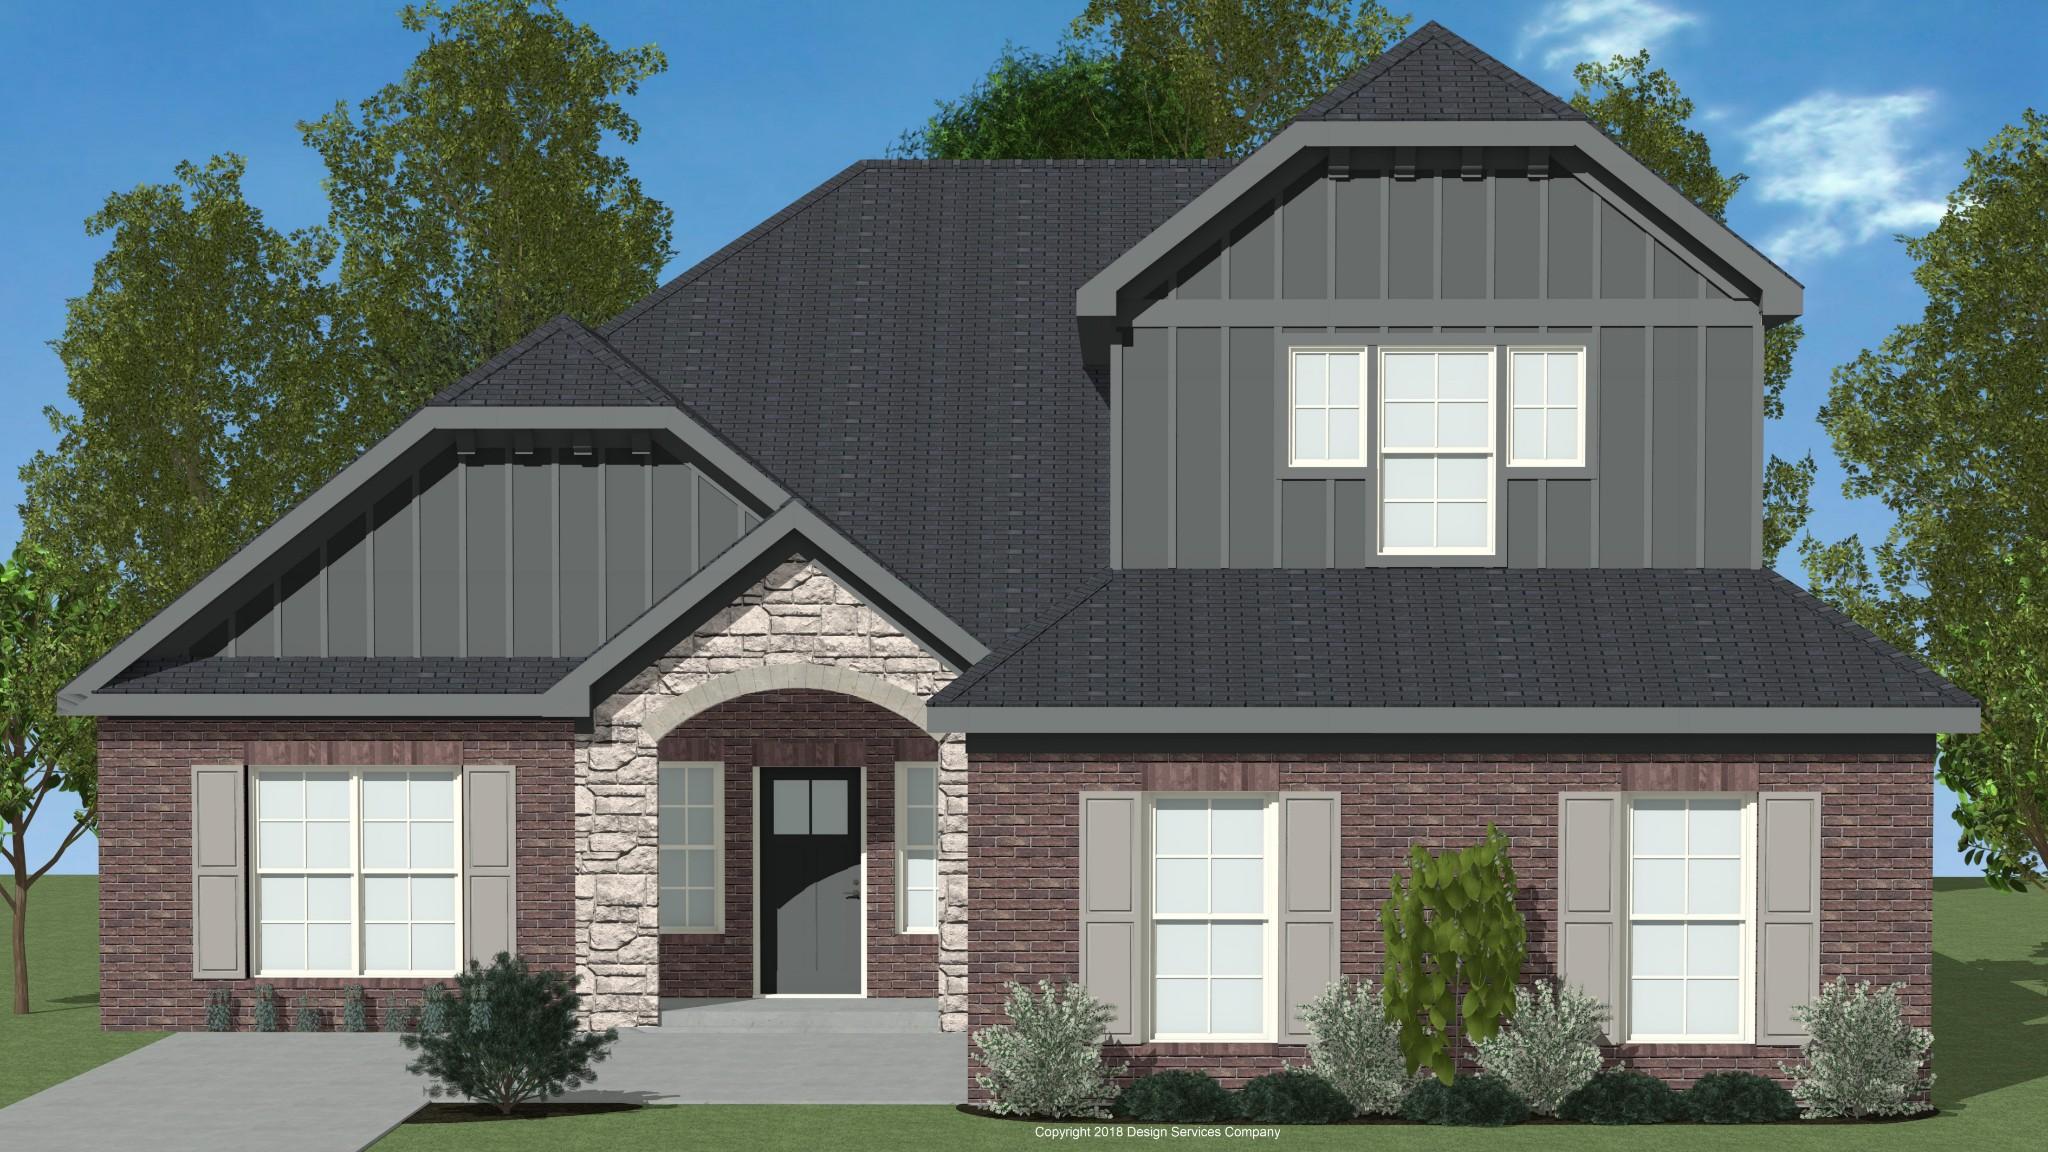 6125 Binns Ln Property Photo - Hermitage, TN real estate listing